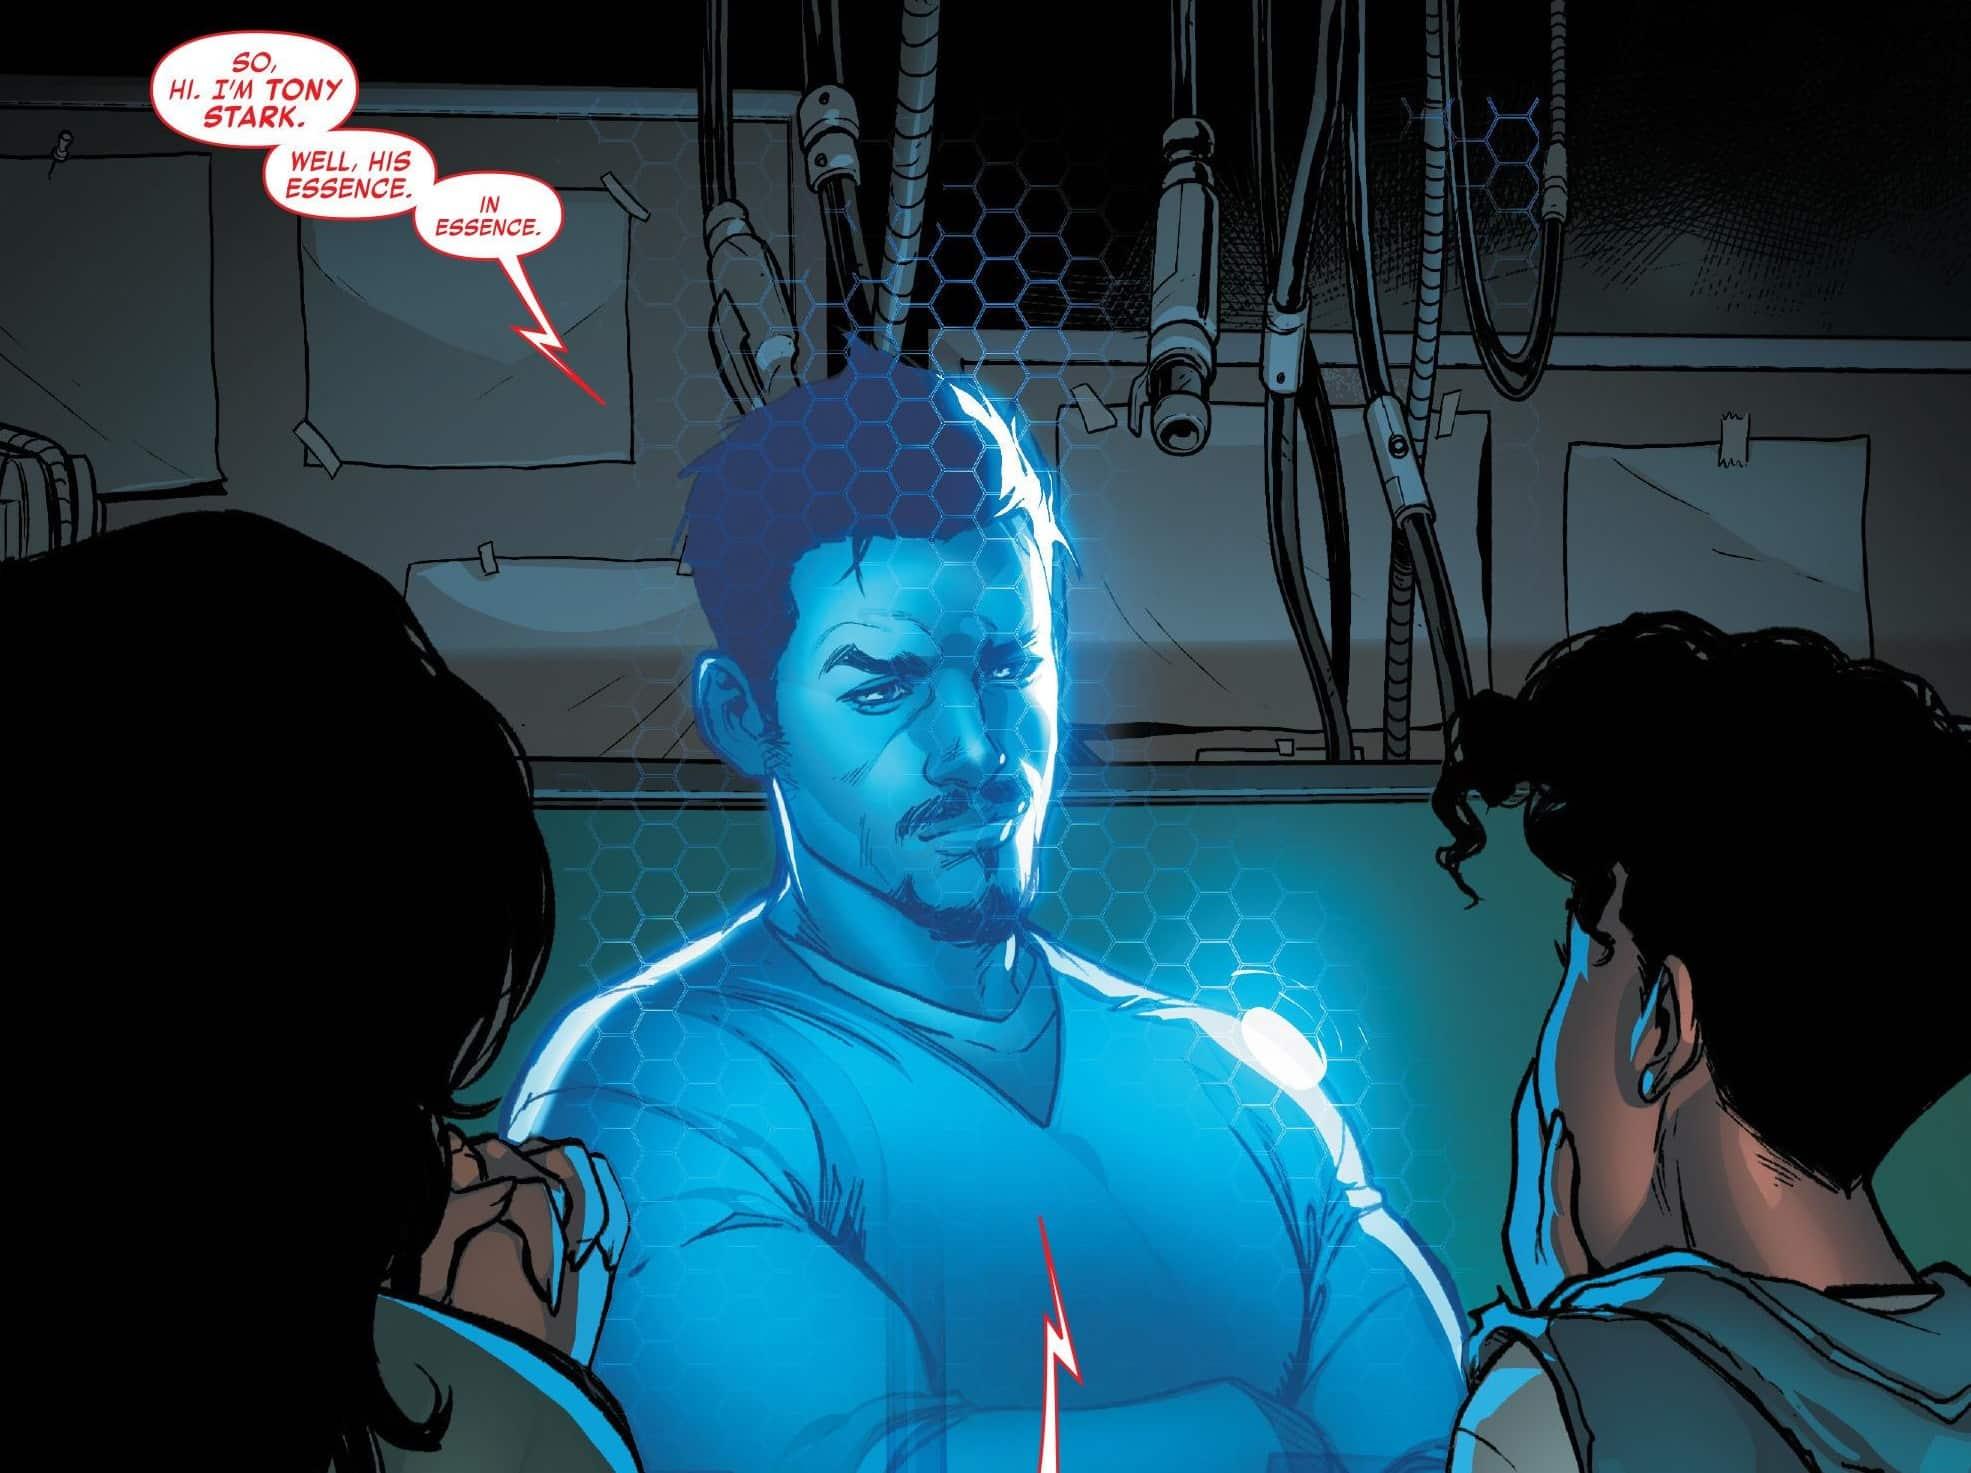 Vengadores: Endgame. Ia de Tony Stark en Ironheart